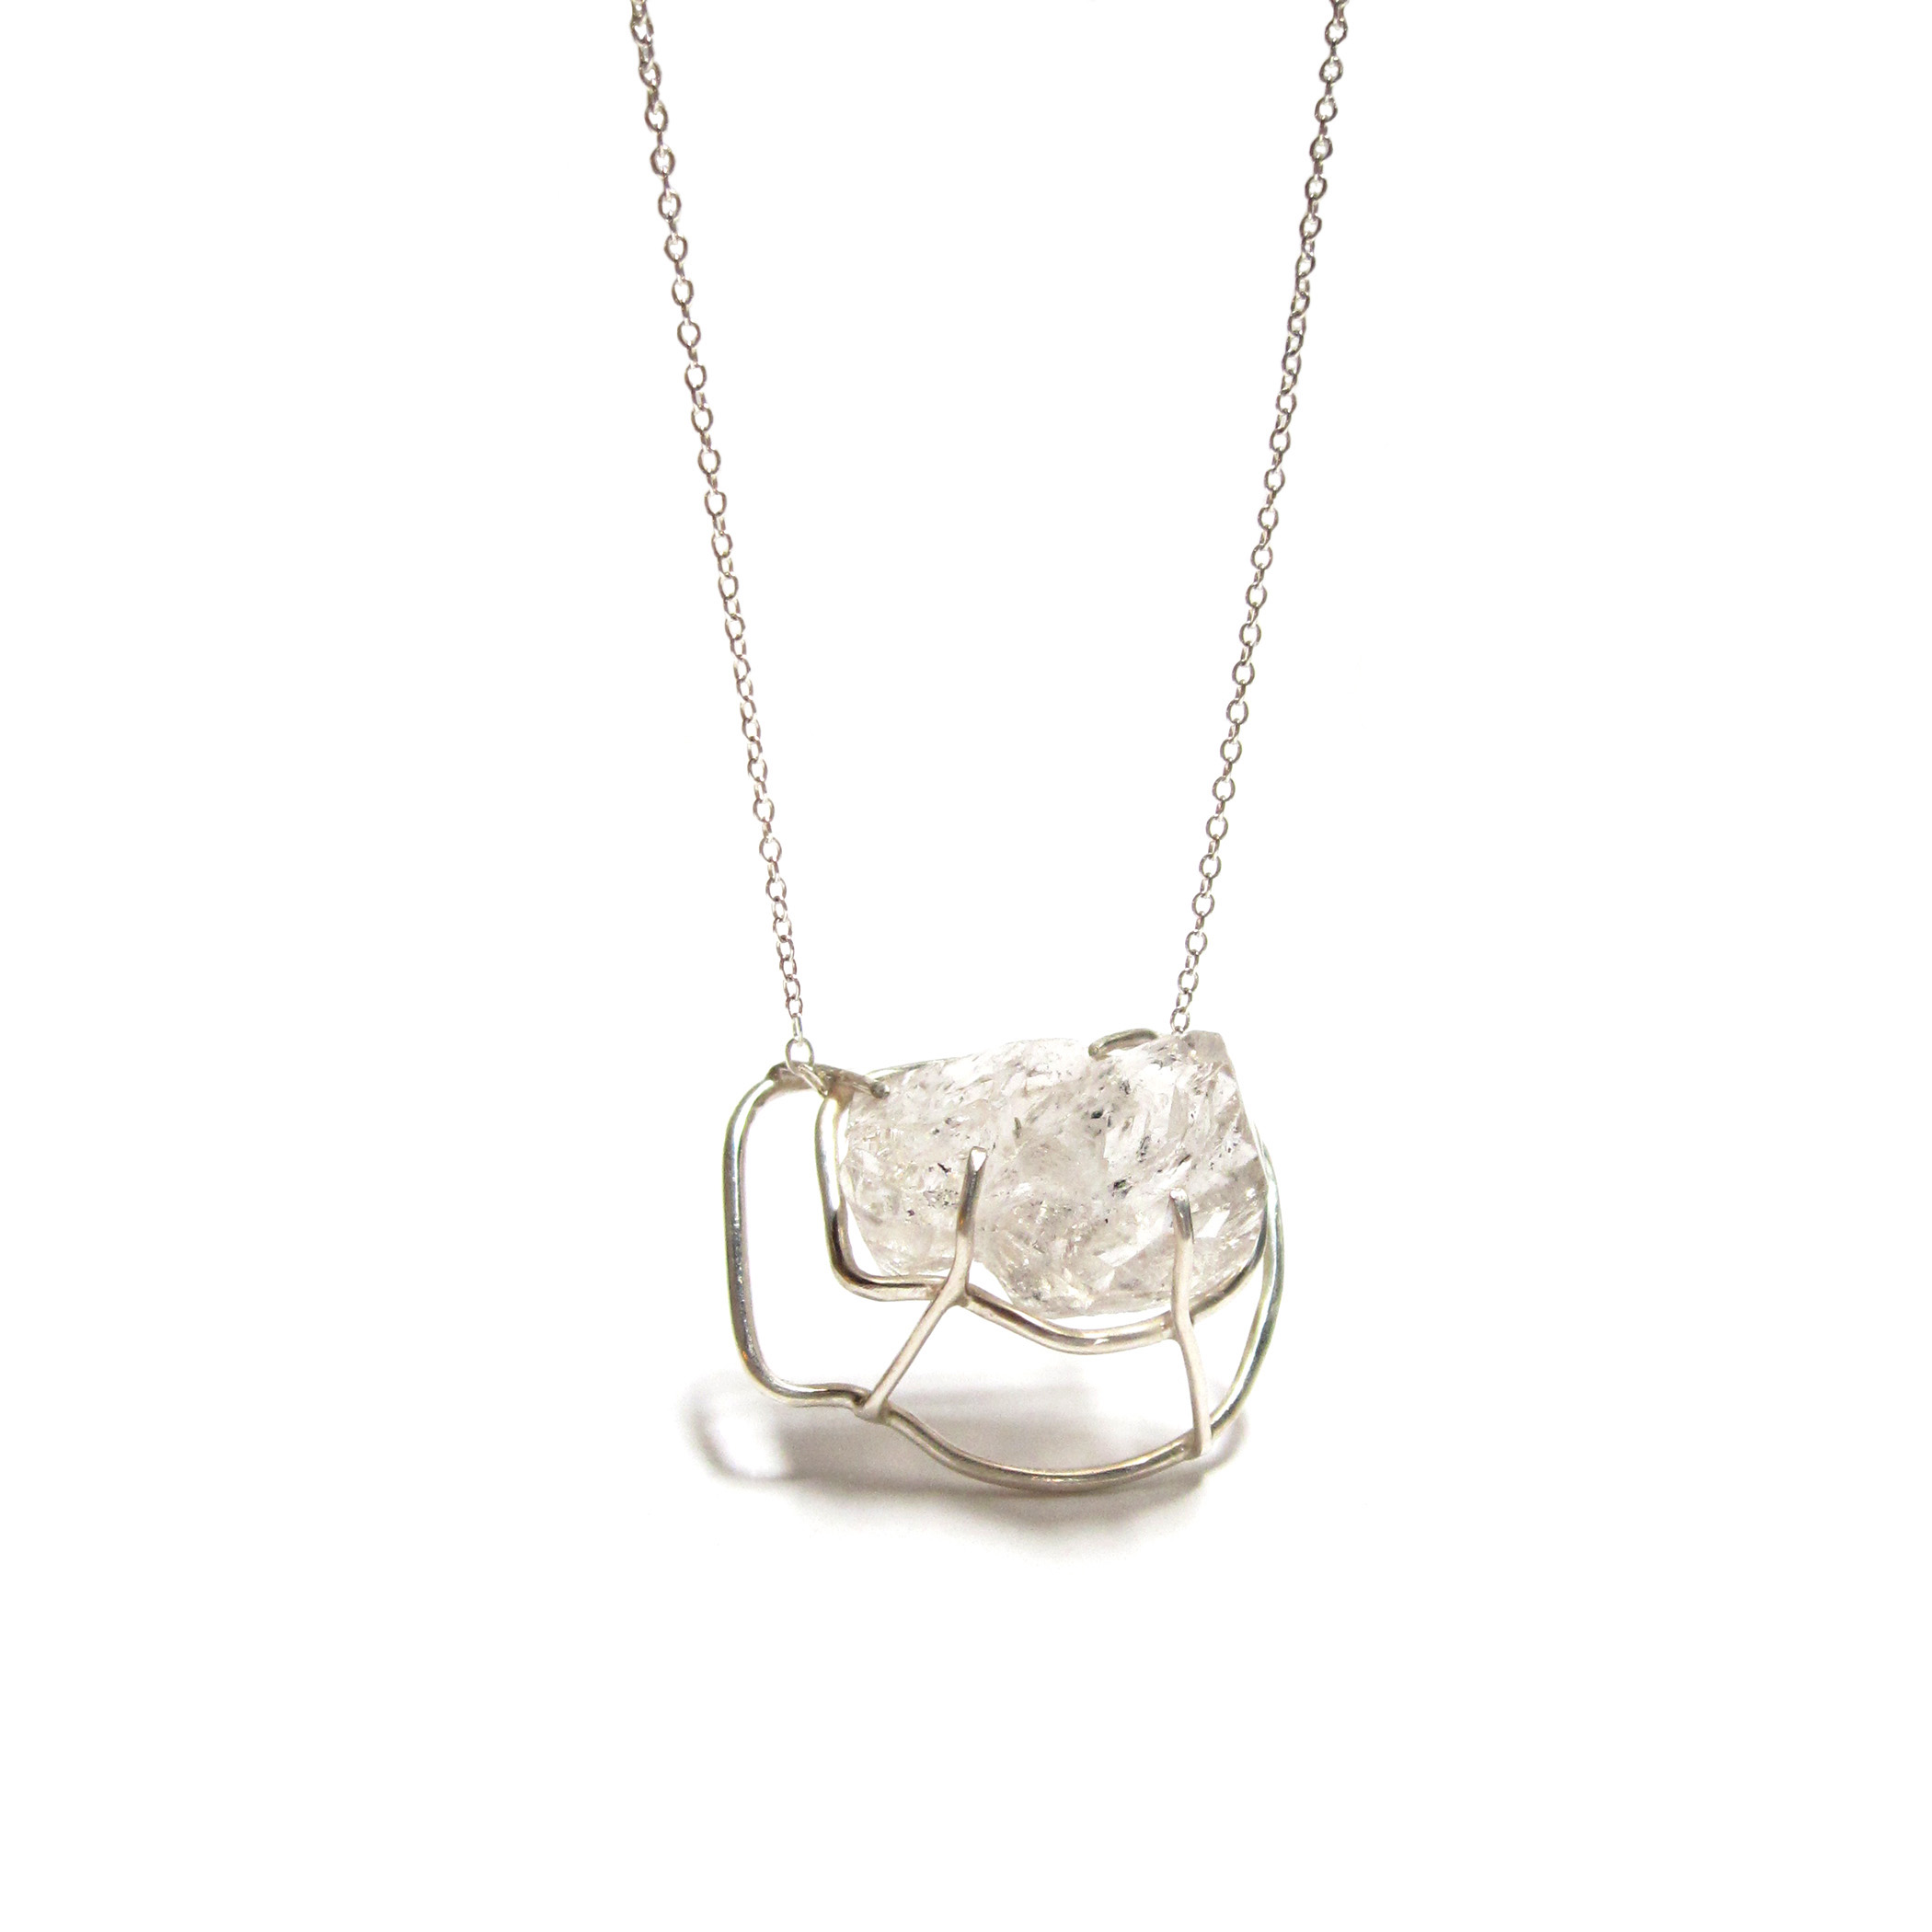 Herkimer diamond sterling silver pendant necklace sparks gallery herkimer diamond sterling silver pendant necklace aloadofball Gallery